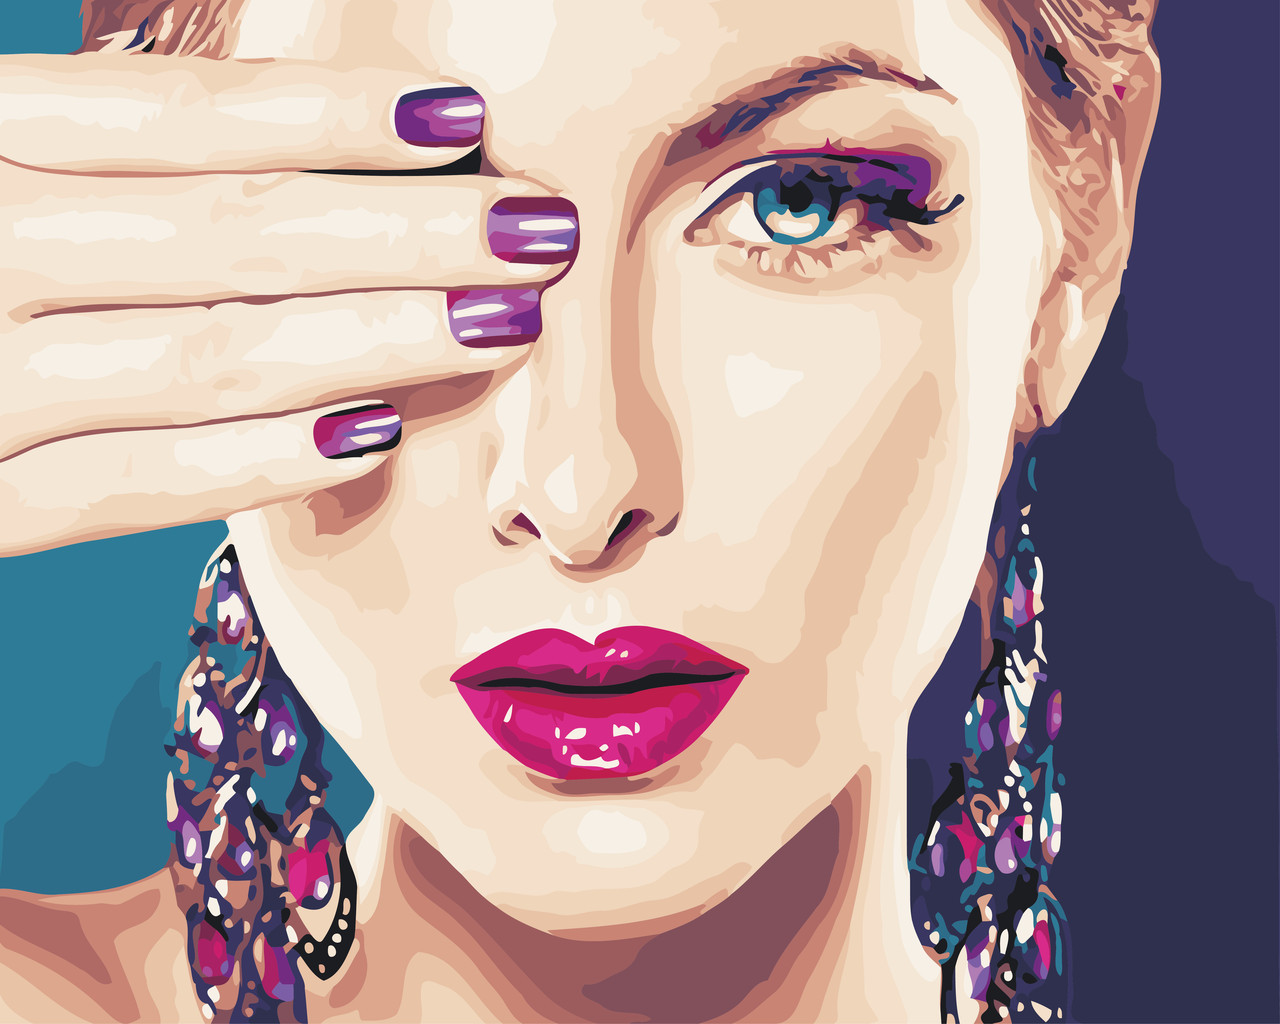 Картина по номерам Вечерний макияж 40 х 50 см (AS0572)